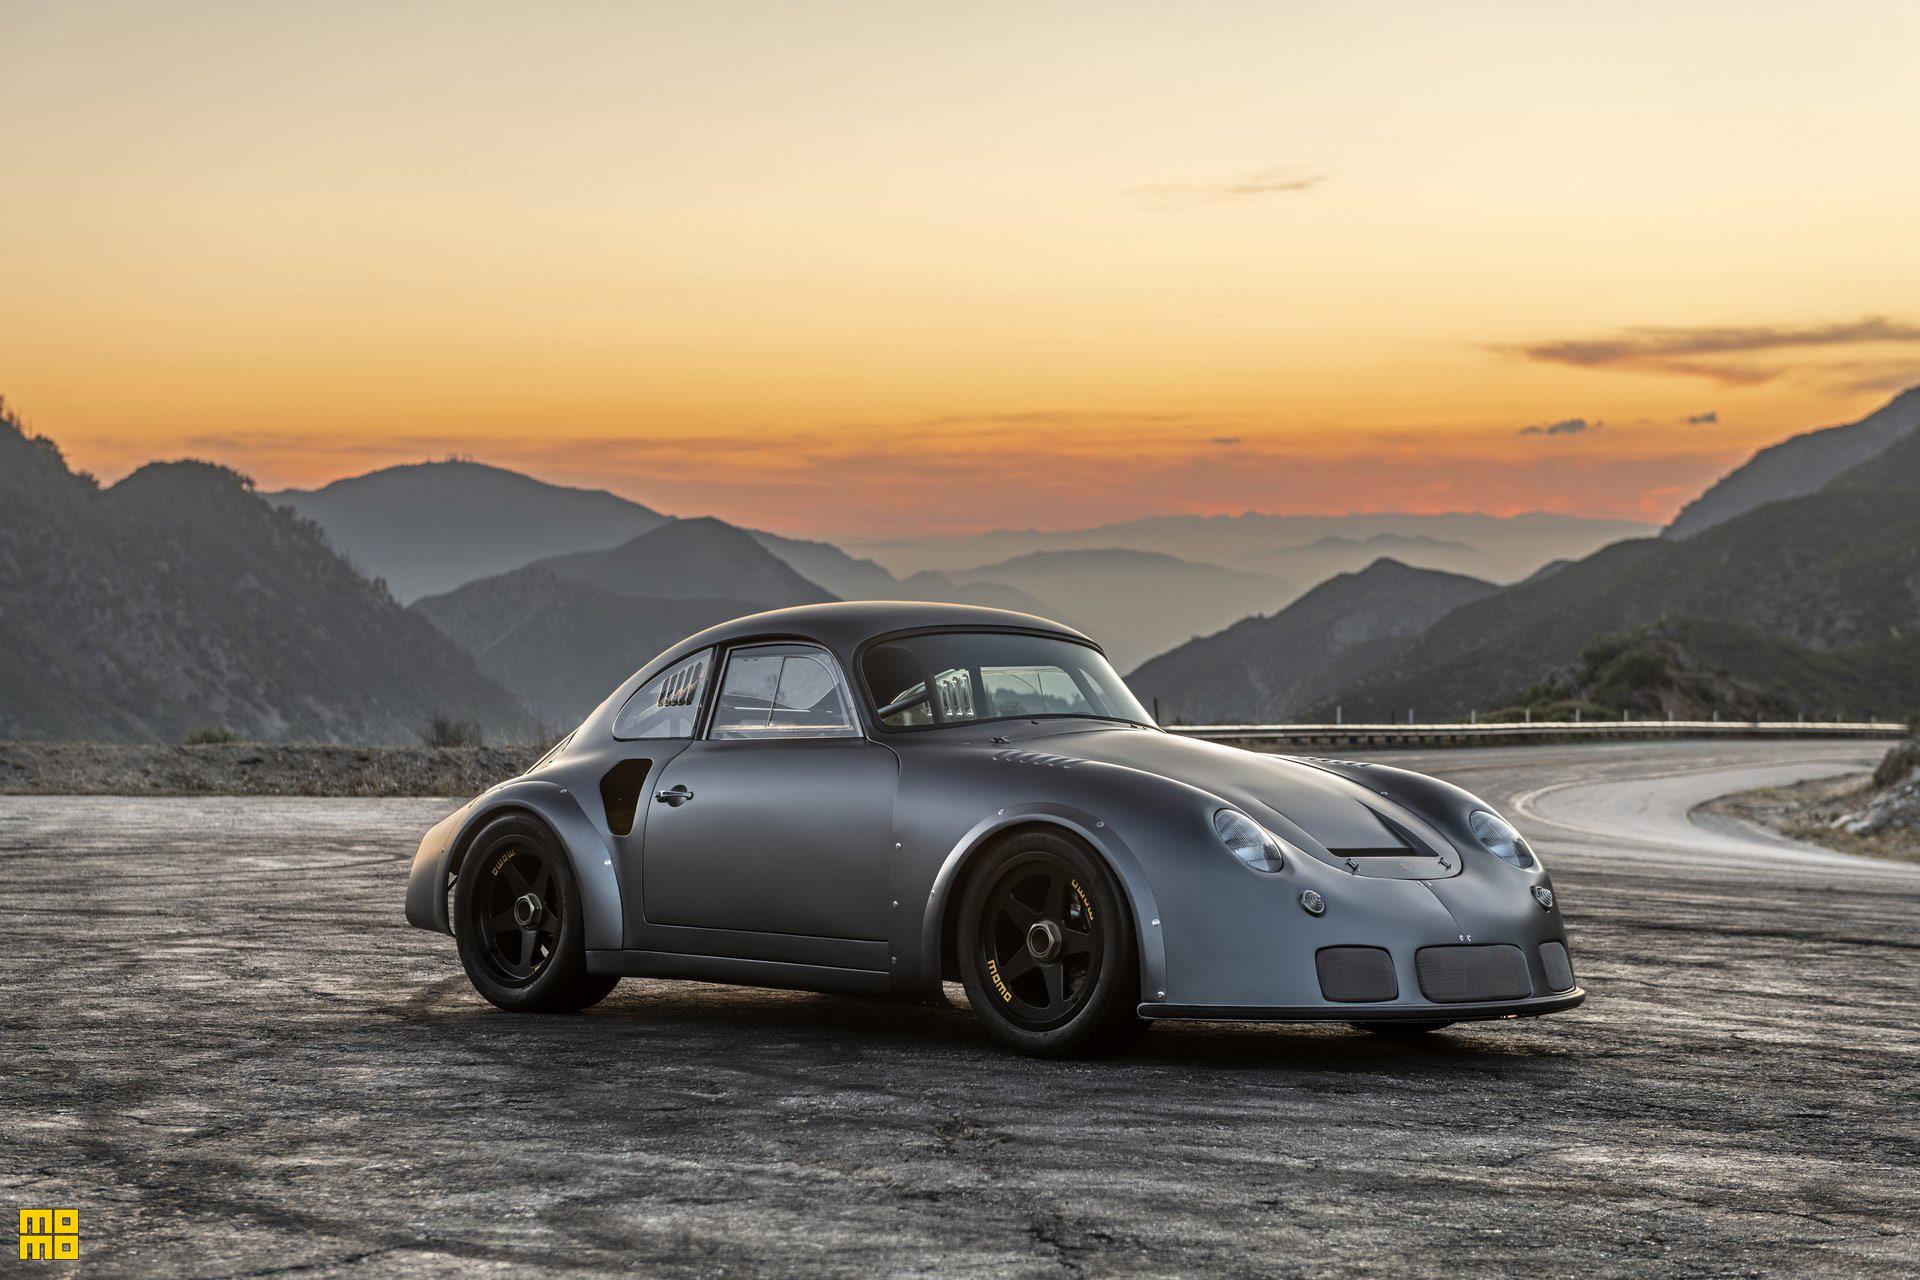 MOMO Emory Porsche 356 RSR Outlaw: Automotive Art & Performance